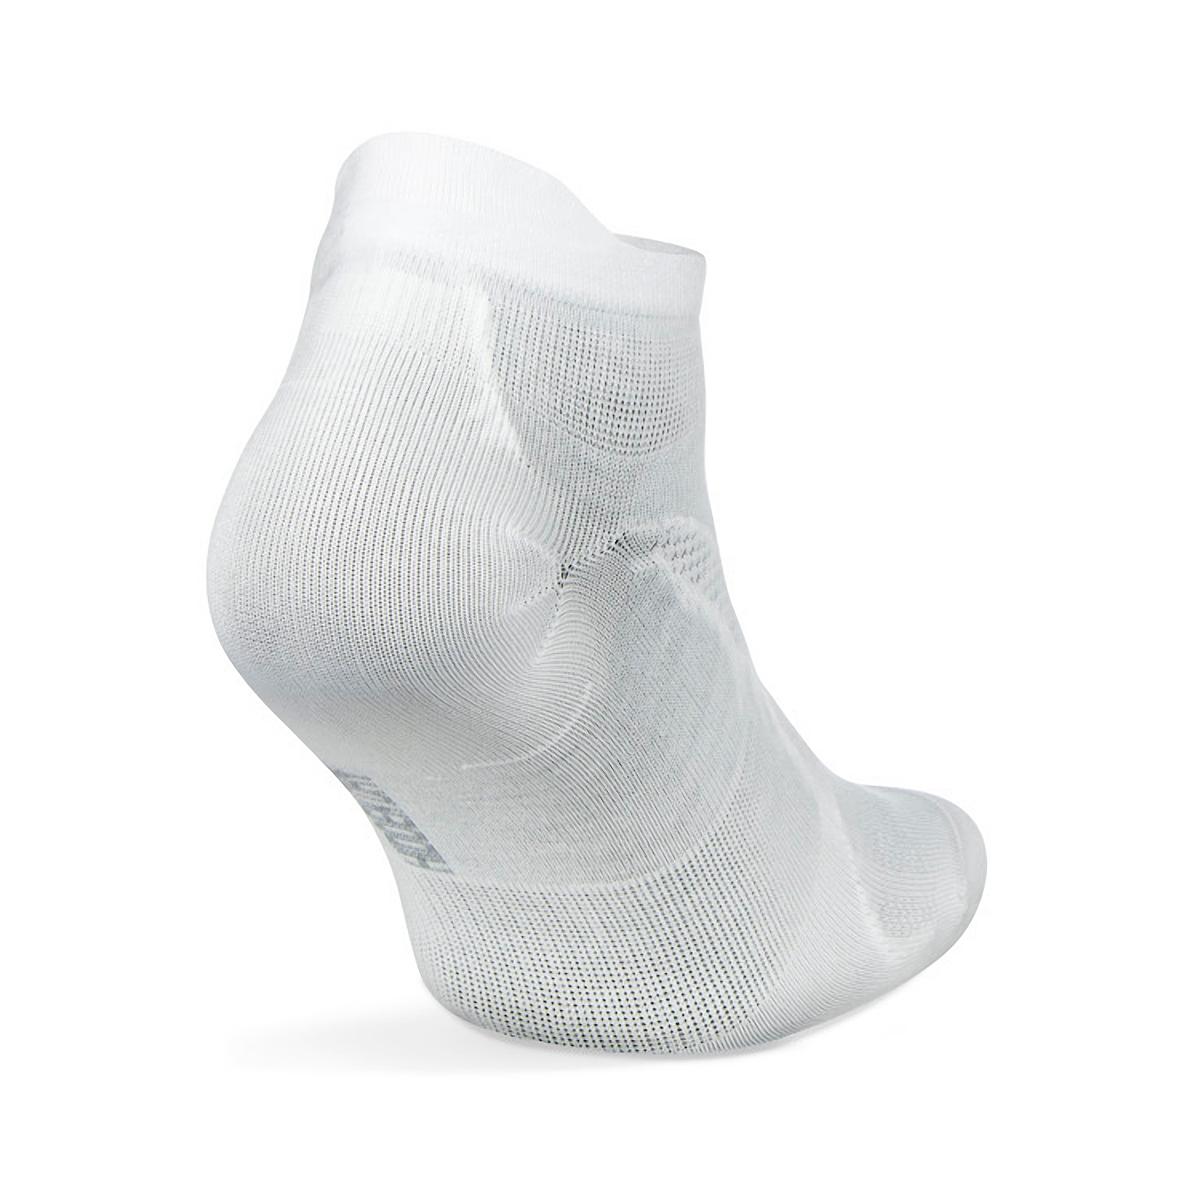 Balega Hidden Dry No Show Socks - Color: White - Size: S, White, large, image 4